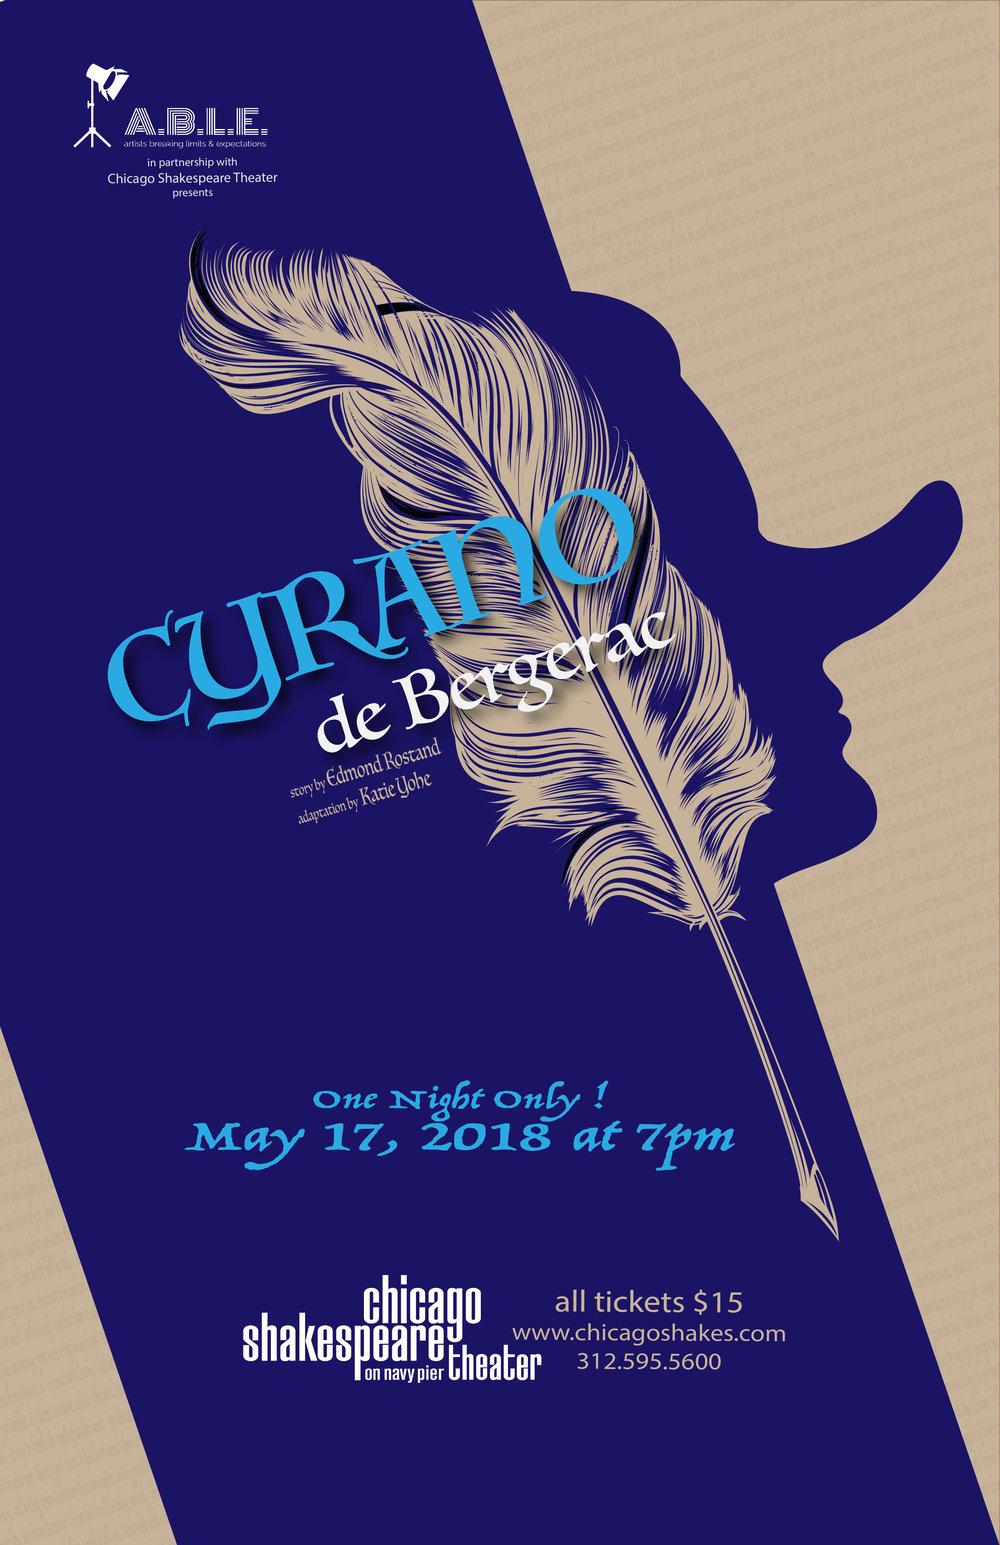 ABLE Cyrano poster v2.jpg